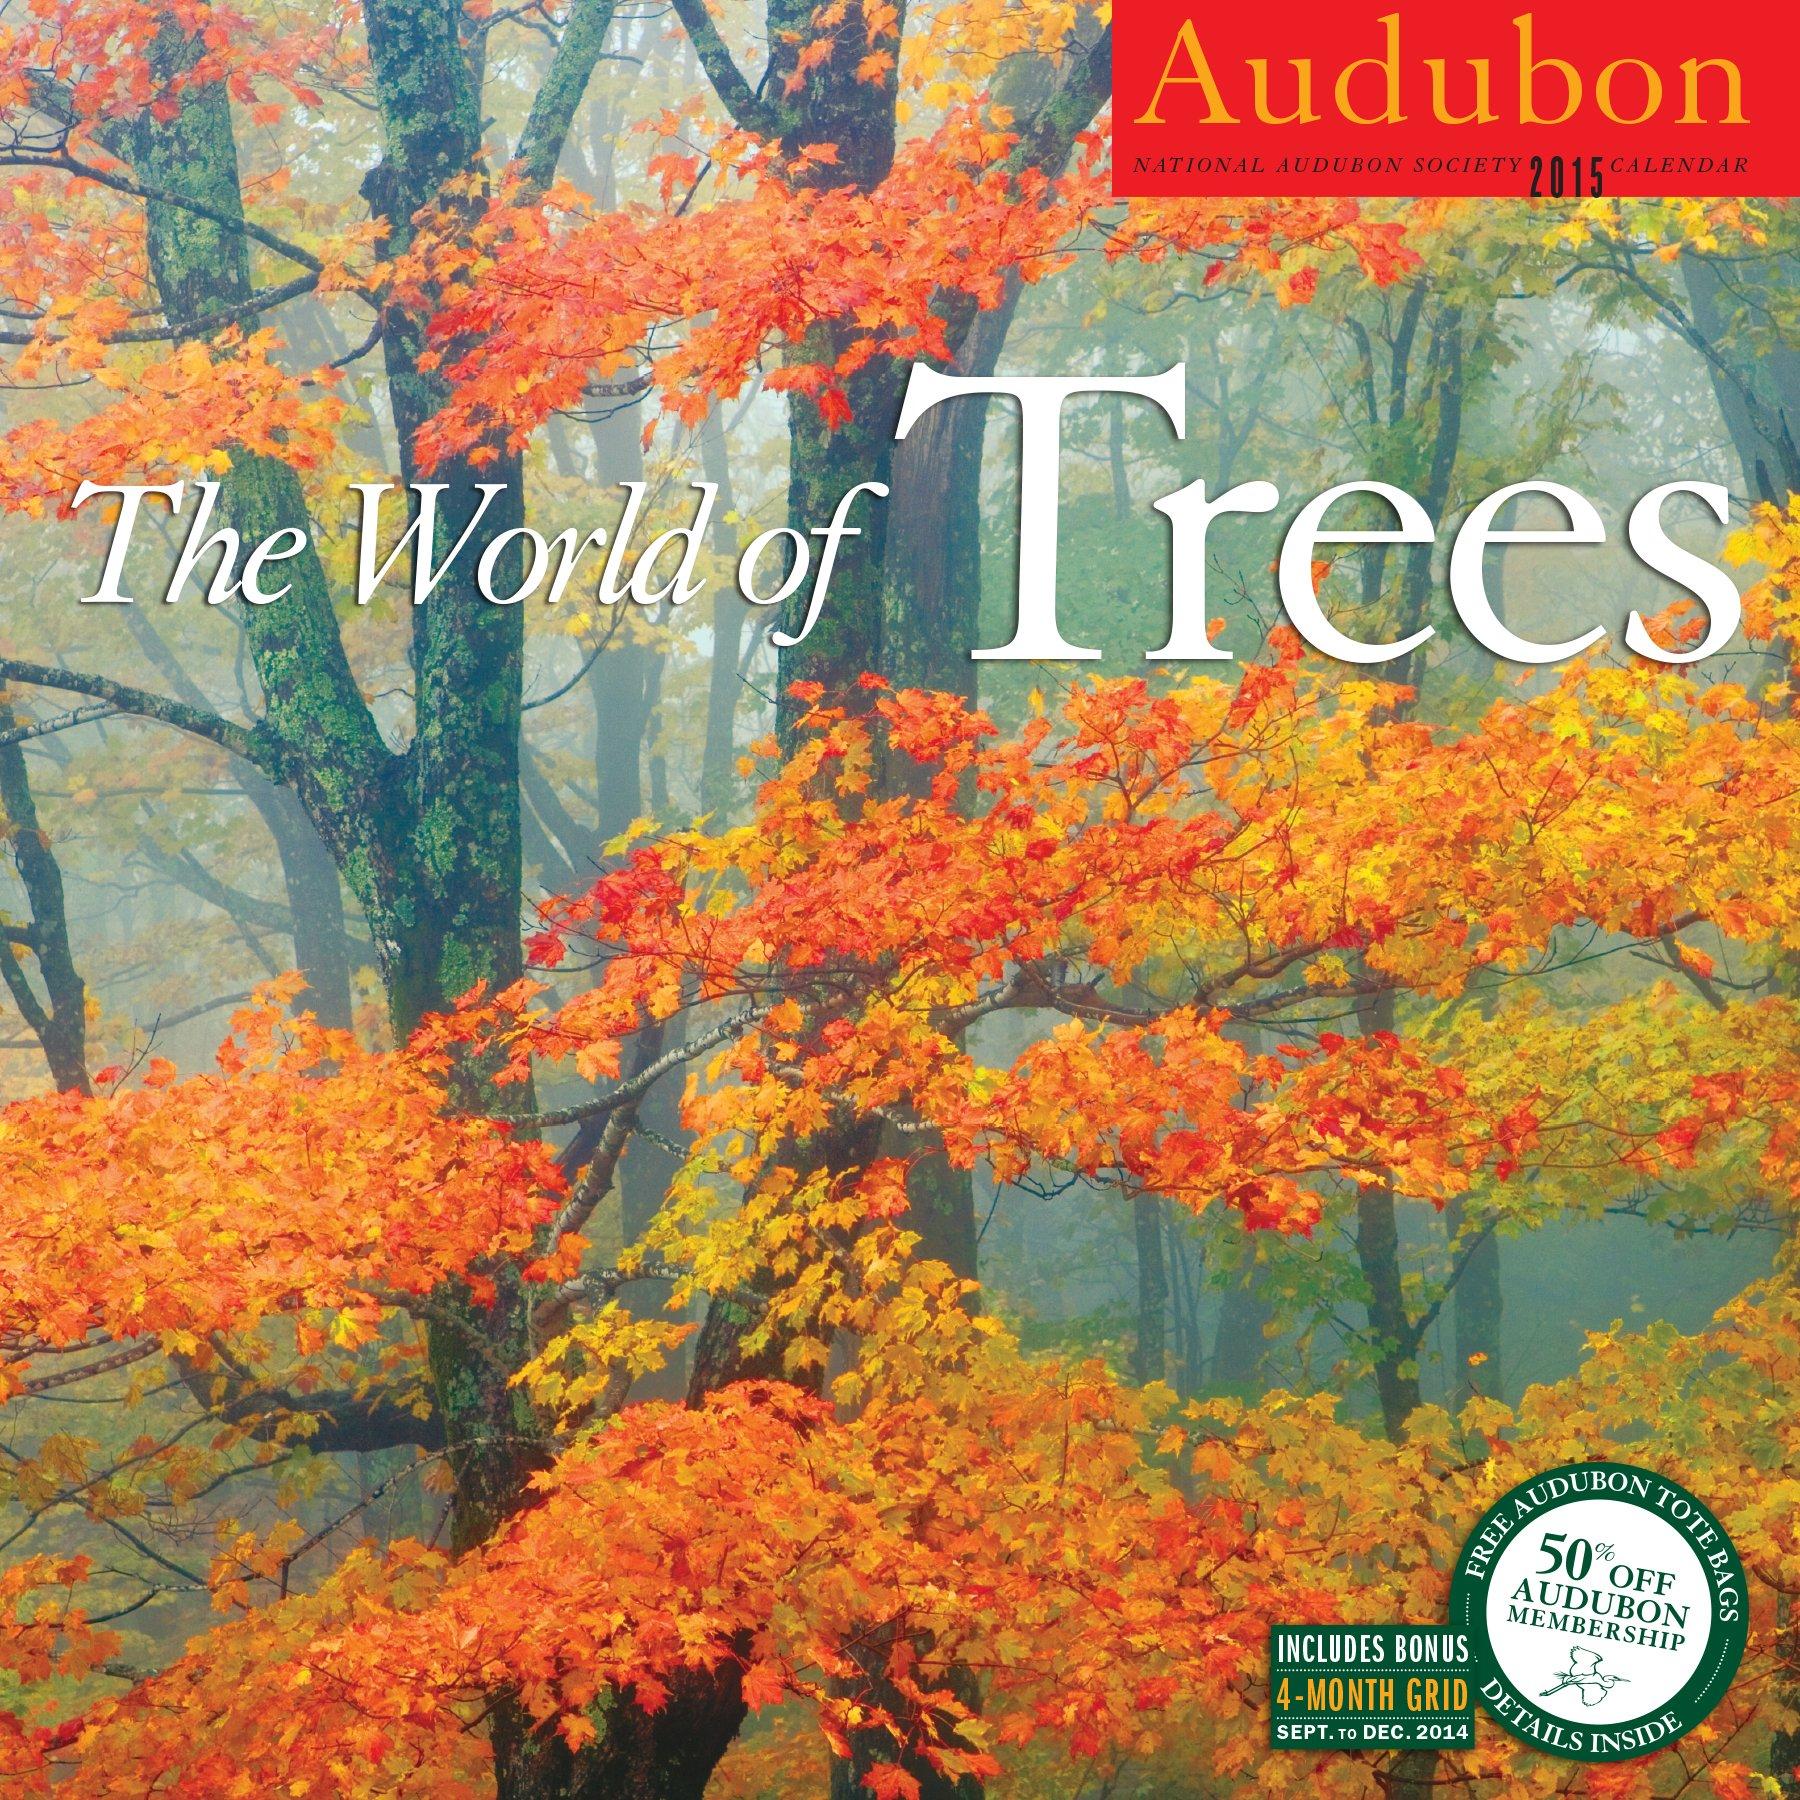 Amazon.com: Audubon the World of Trees Calendar 2015 (9781579655761):  National Audubon Society: Books